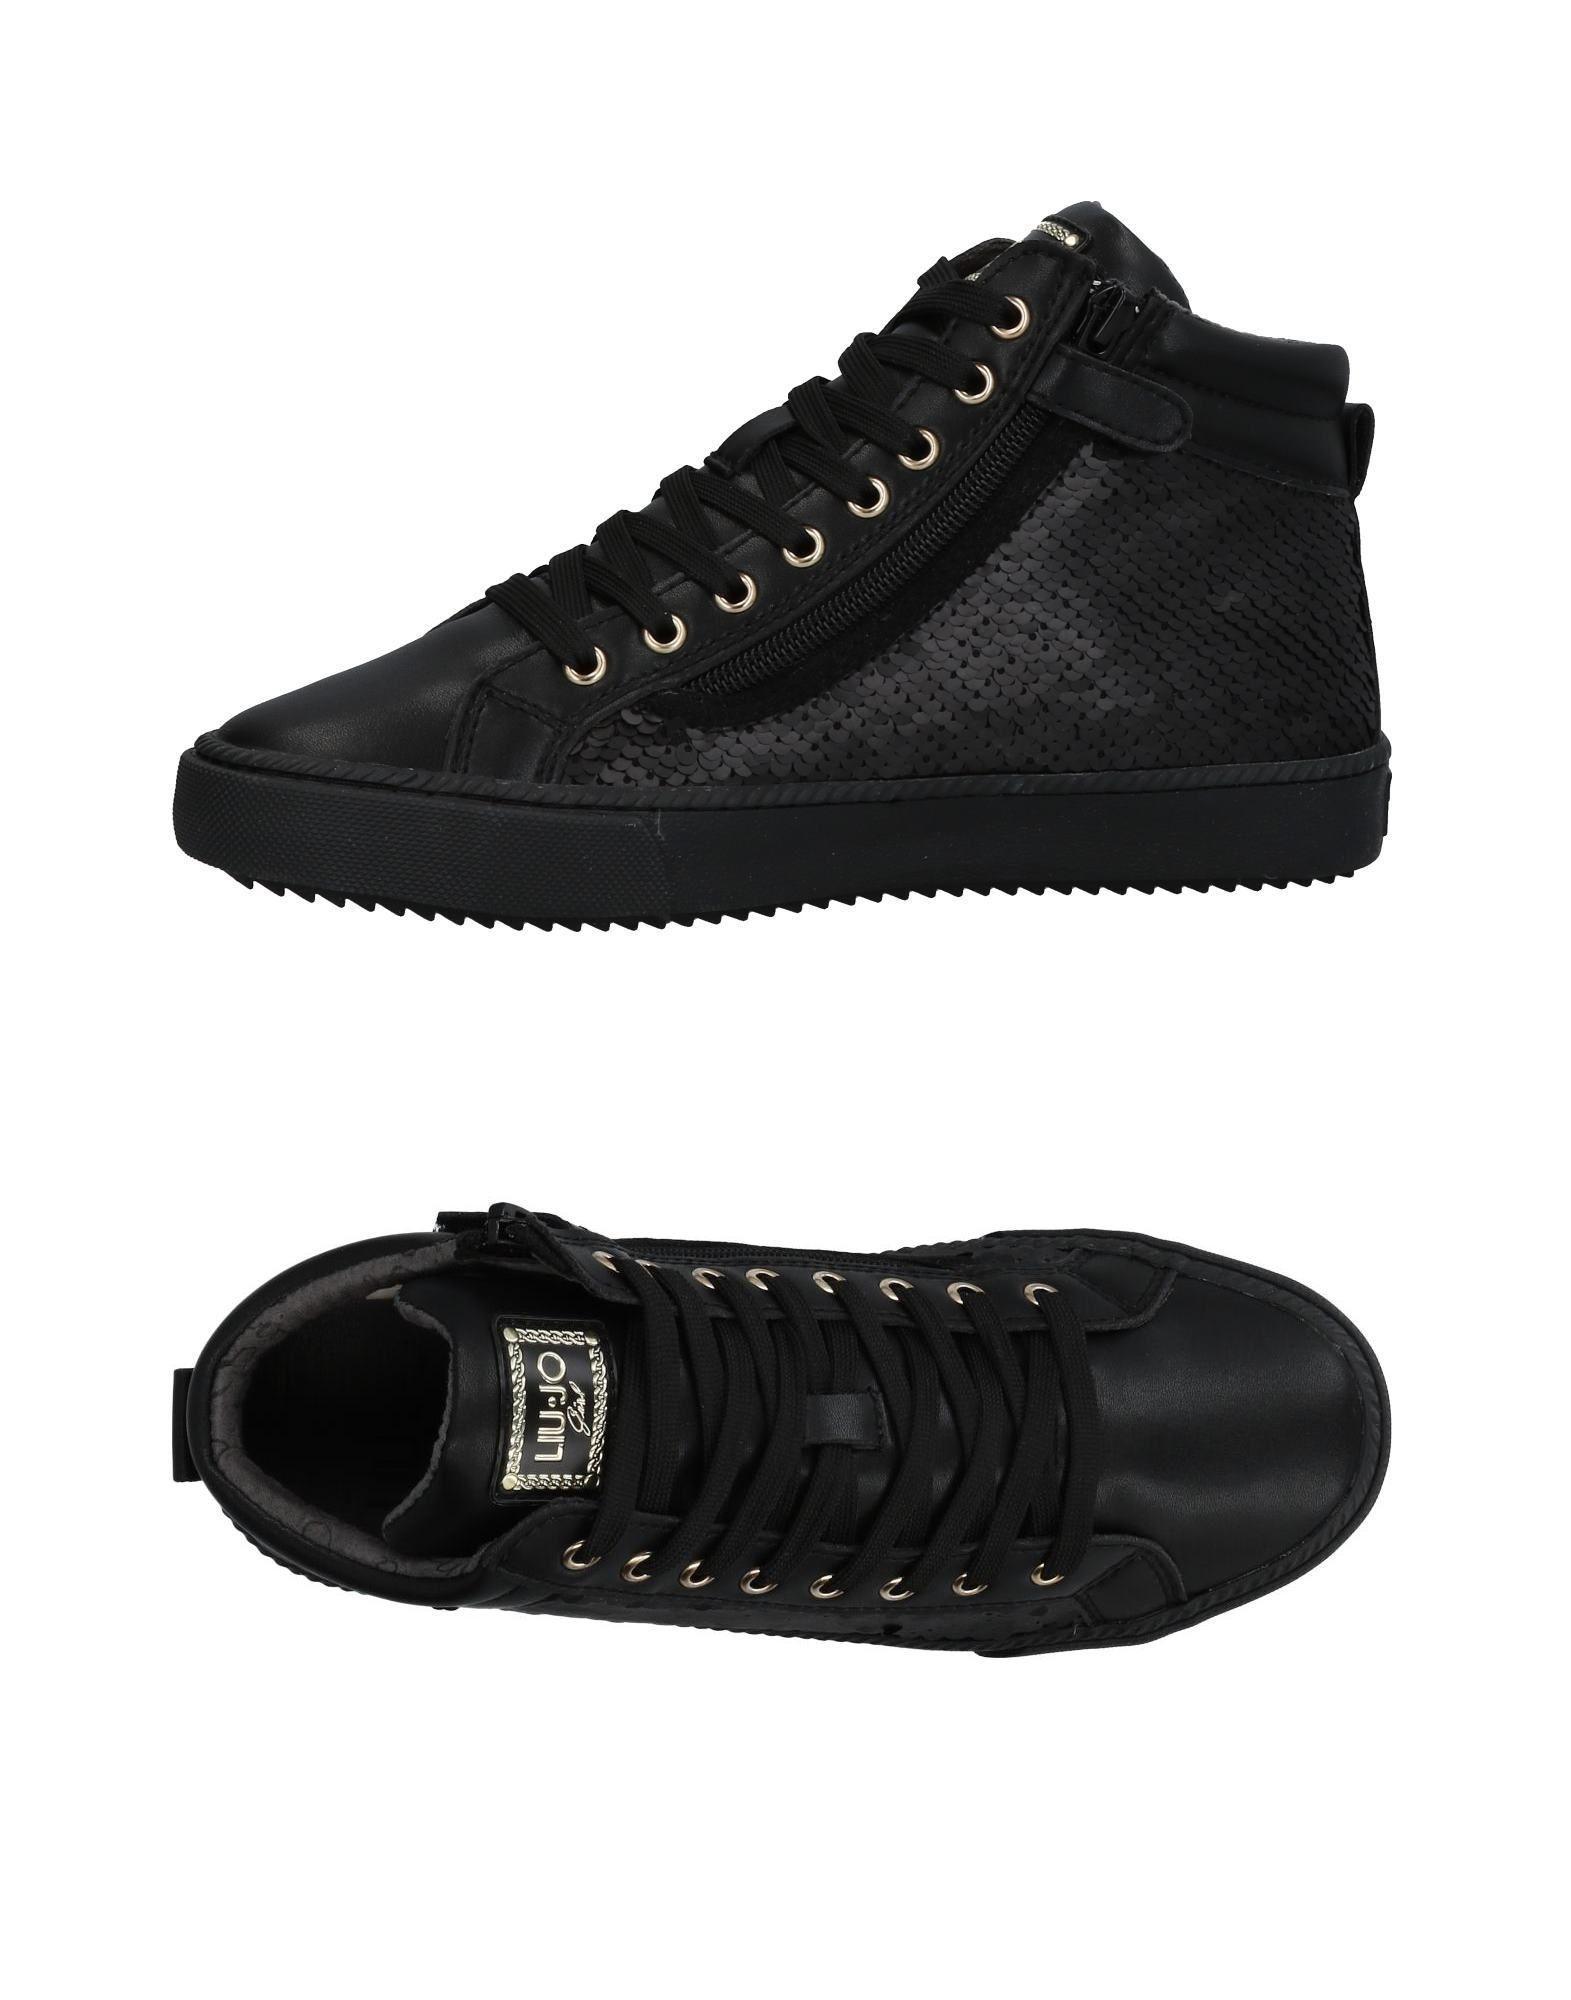 ?Liu Chaussures Jo-hauts Sommets Et Baskets EVbS5